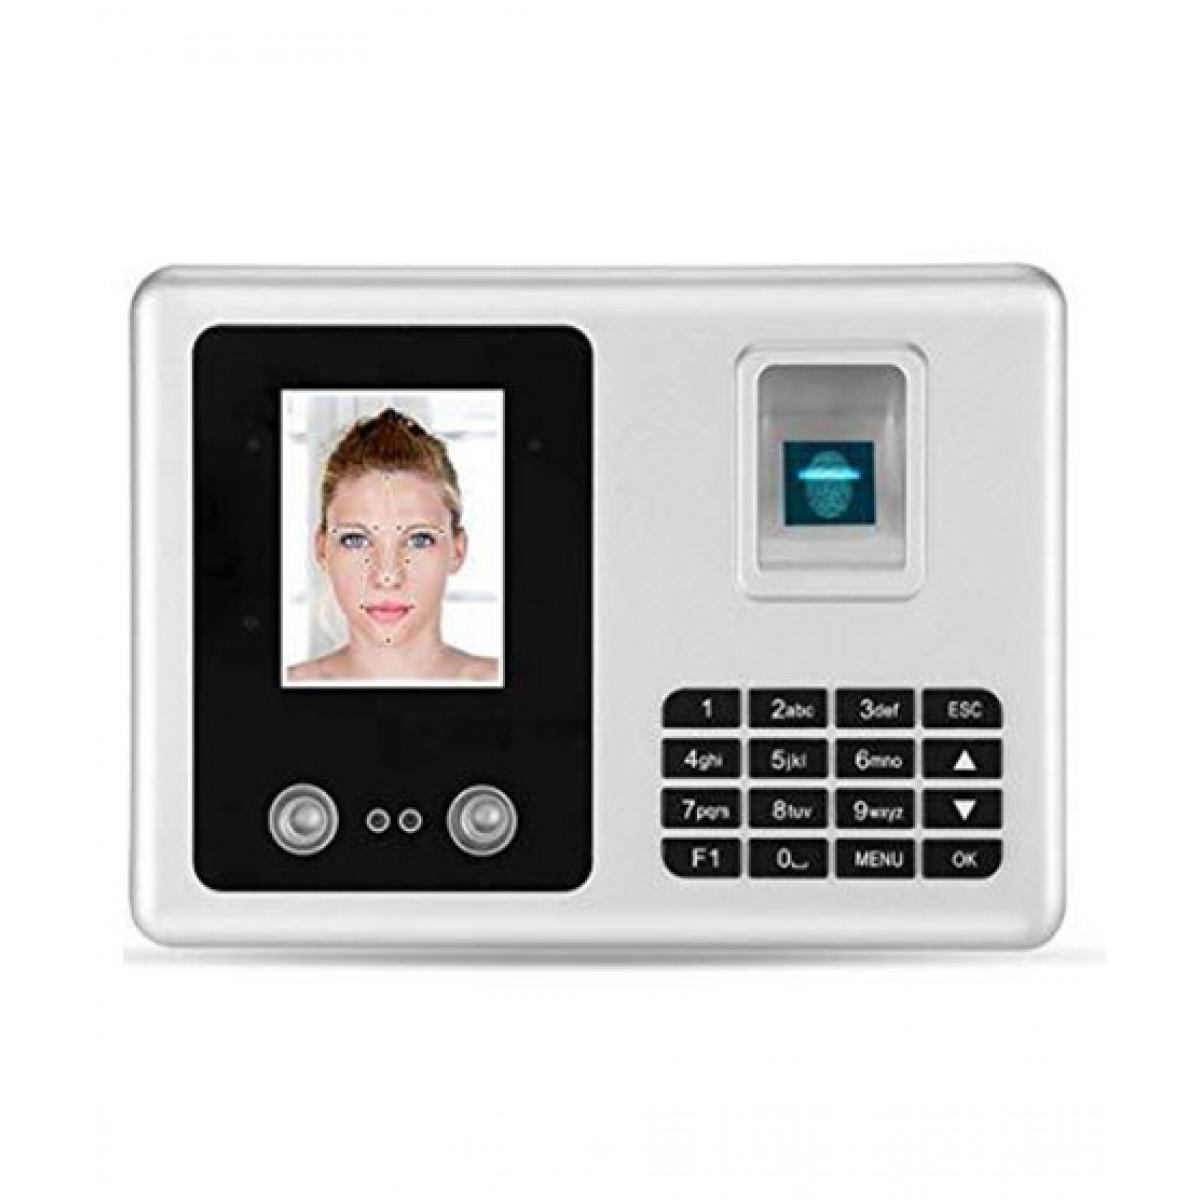 Proxymedia Face & Fingerprint Attendance Machine (MR670)